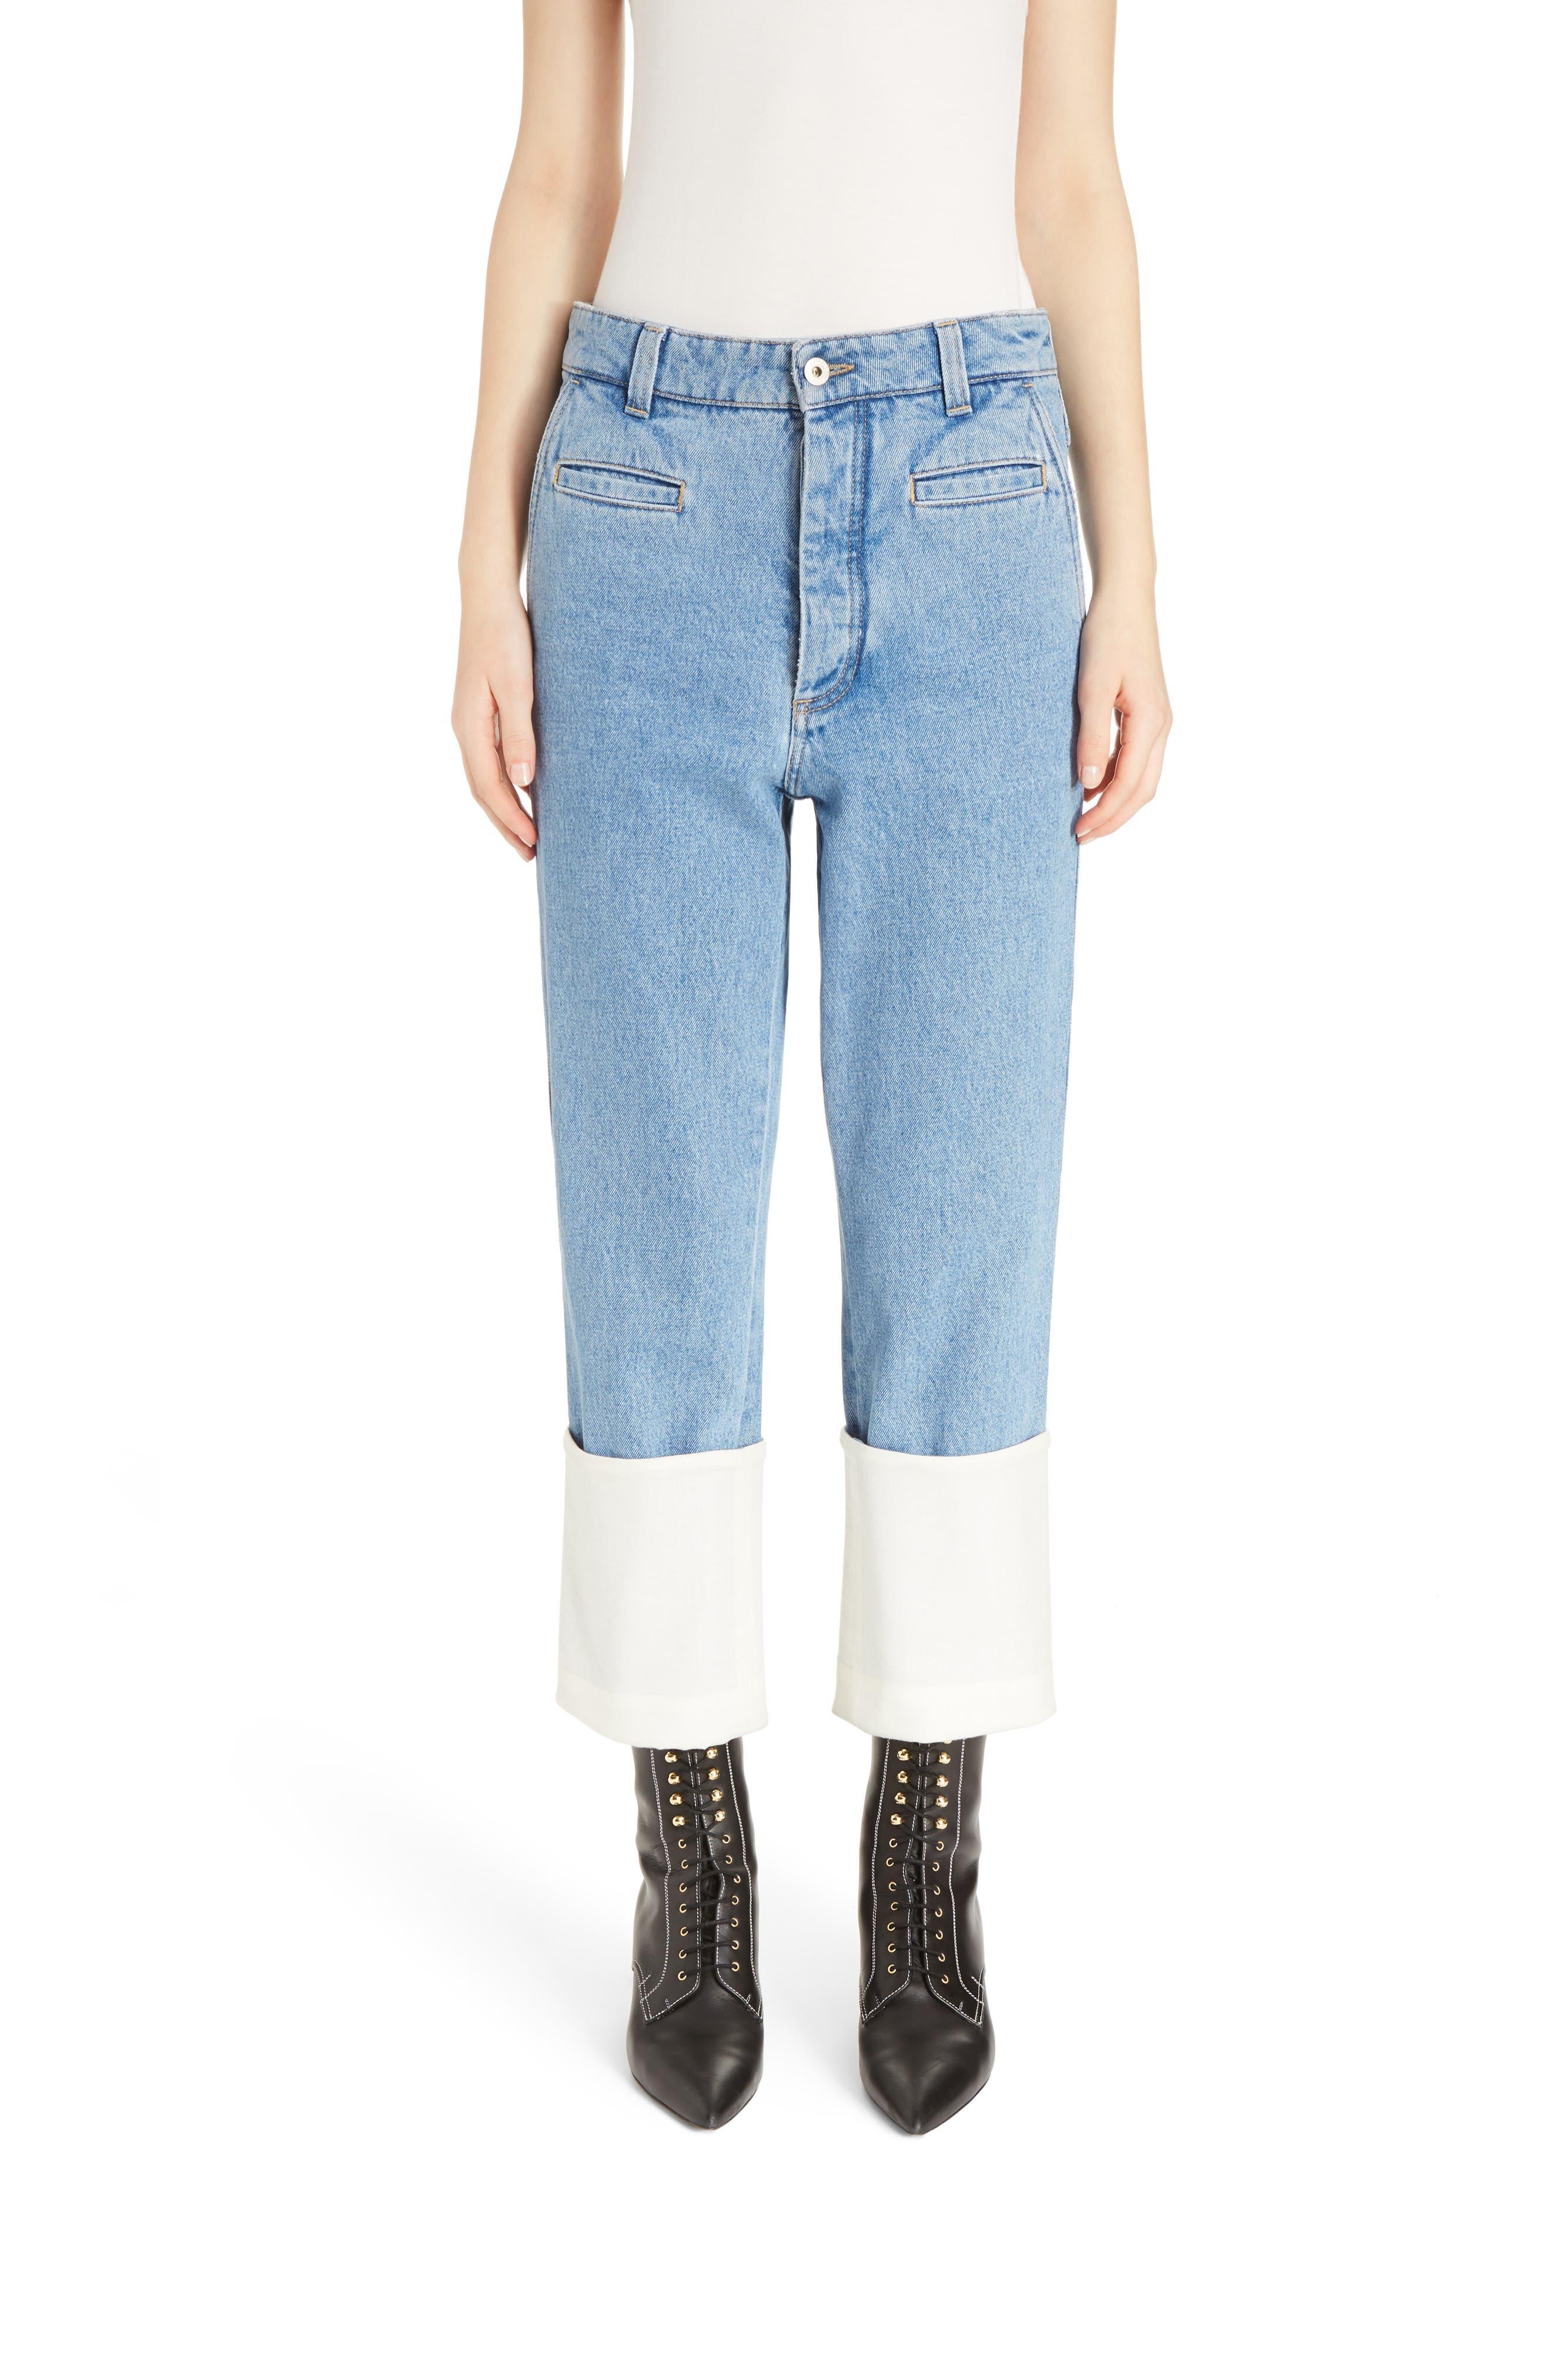 Main Image - Loewe Fisherman Cuffed Jeans